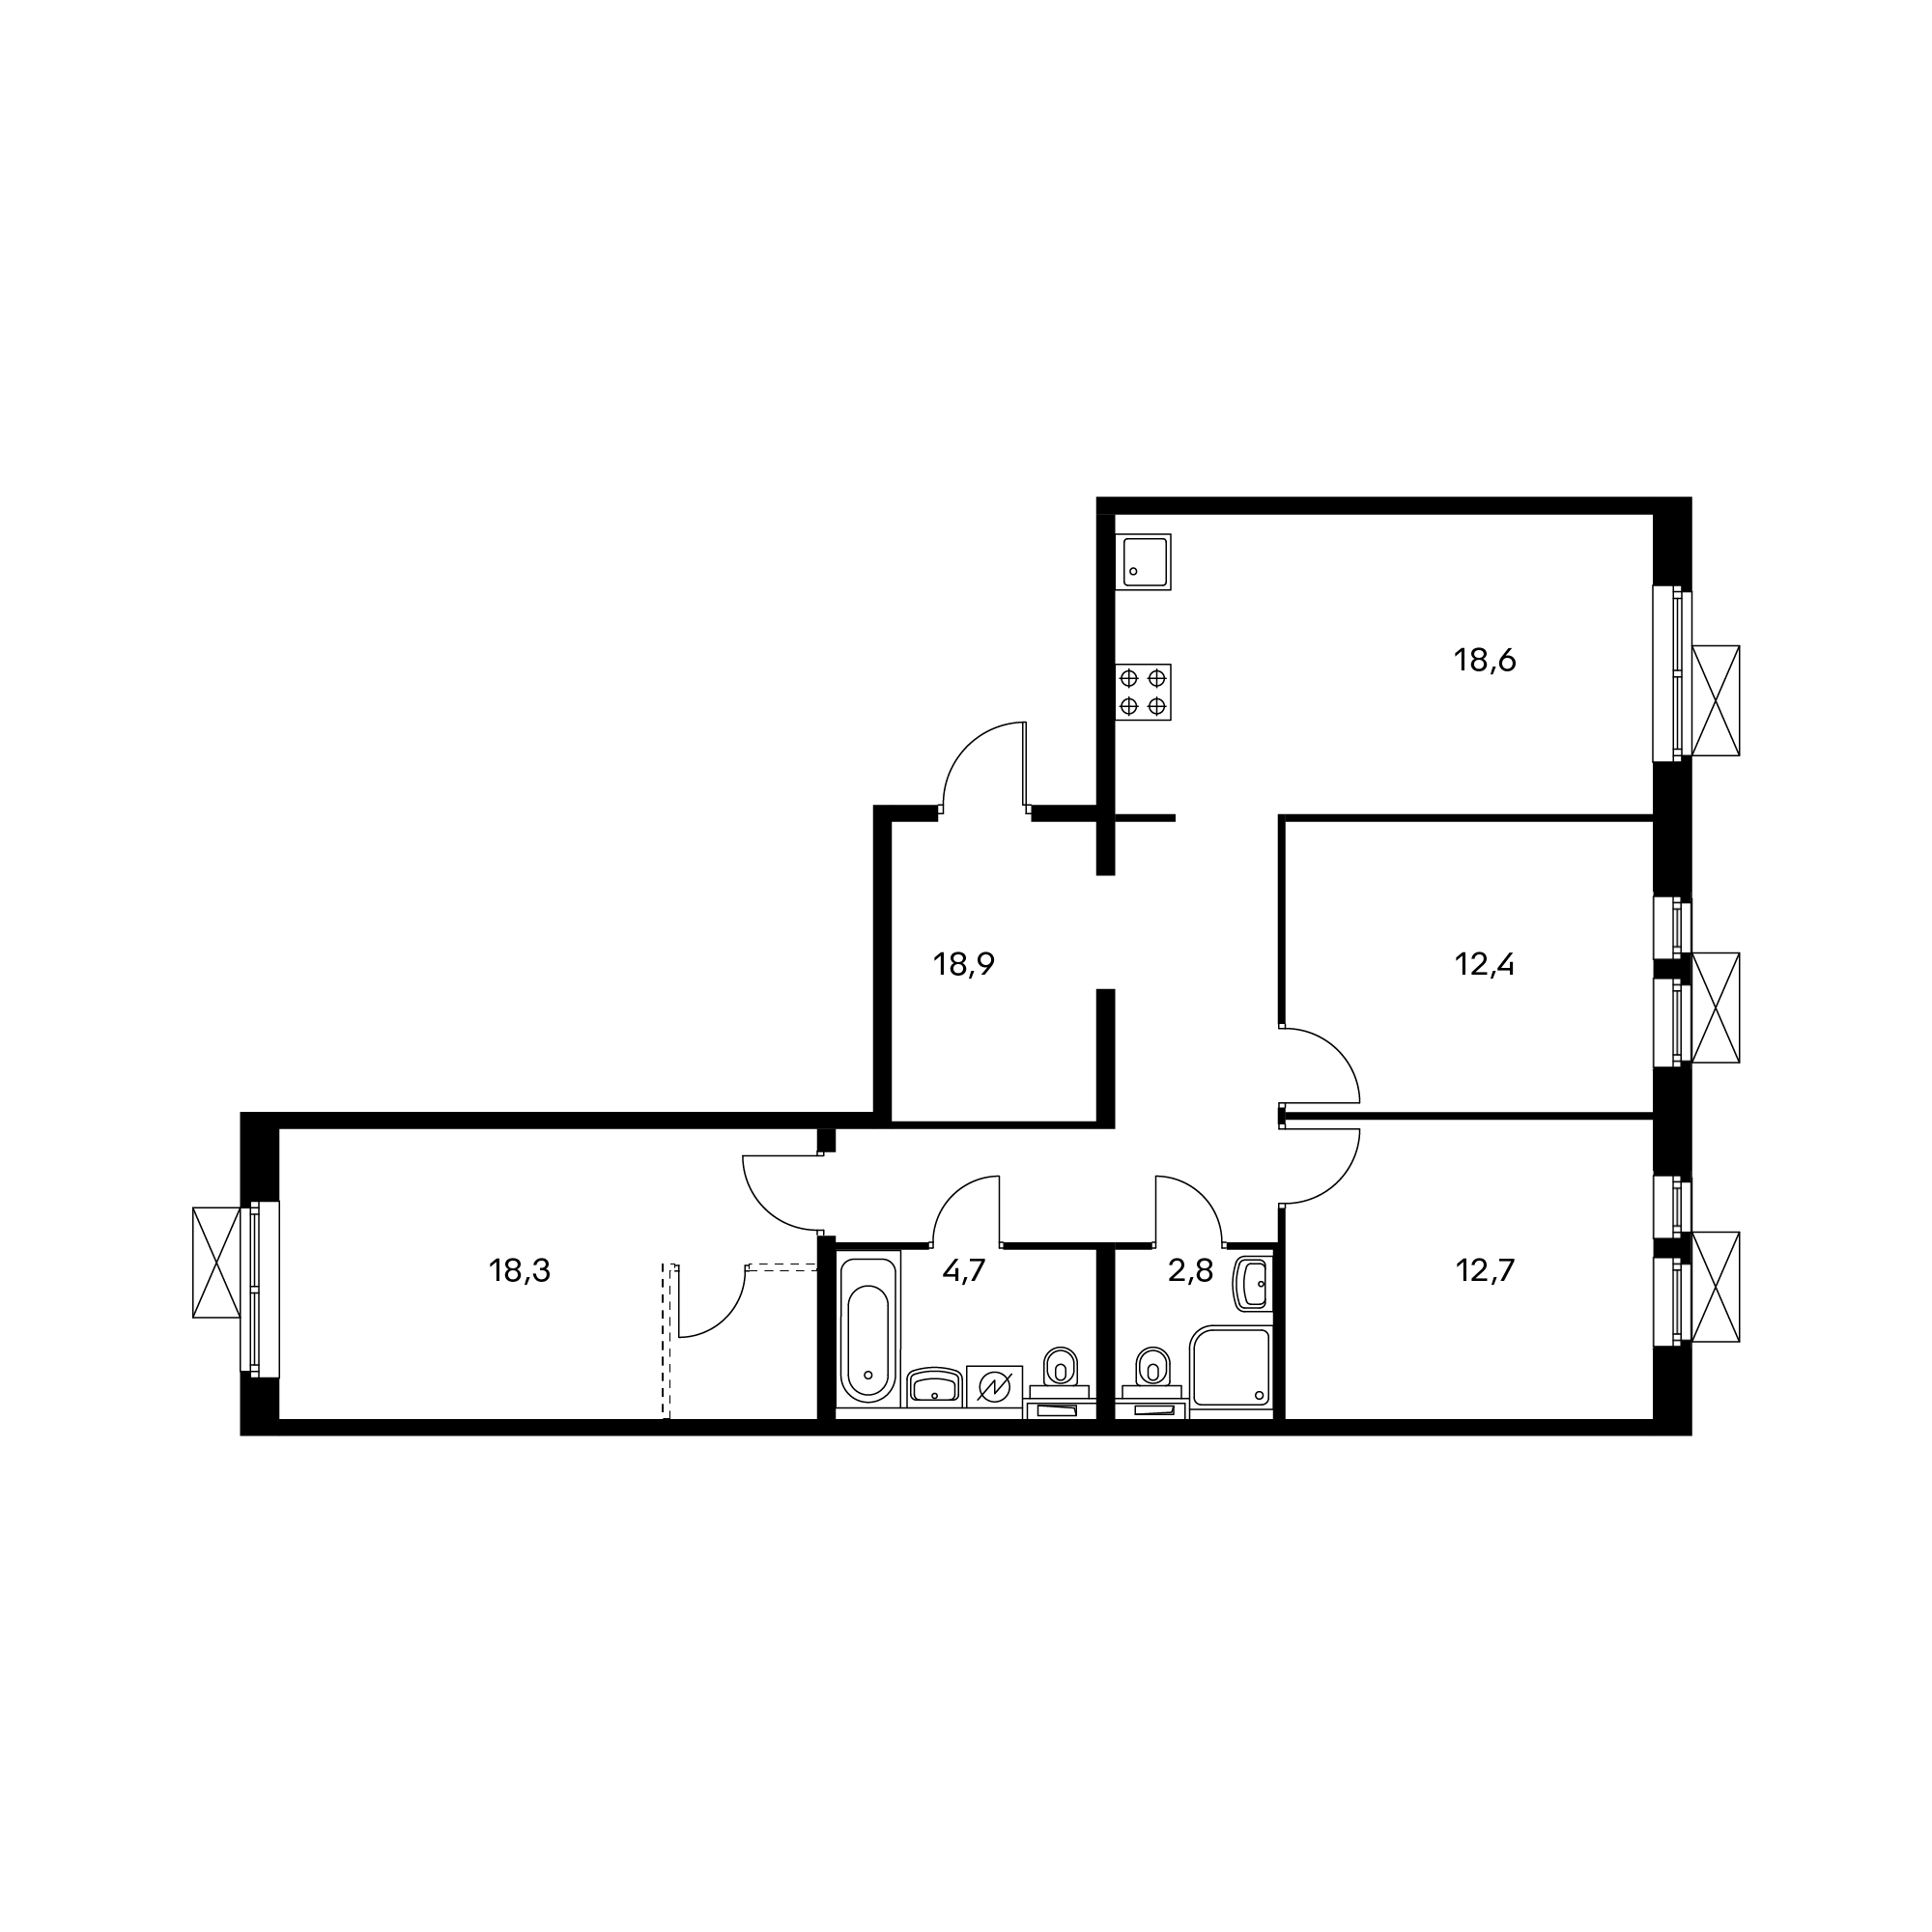 3EL3_9.9-6*